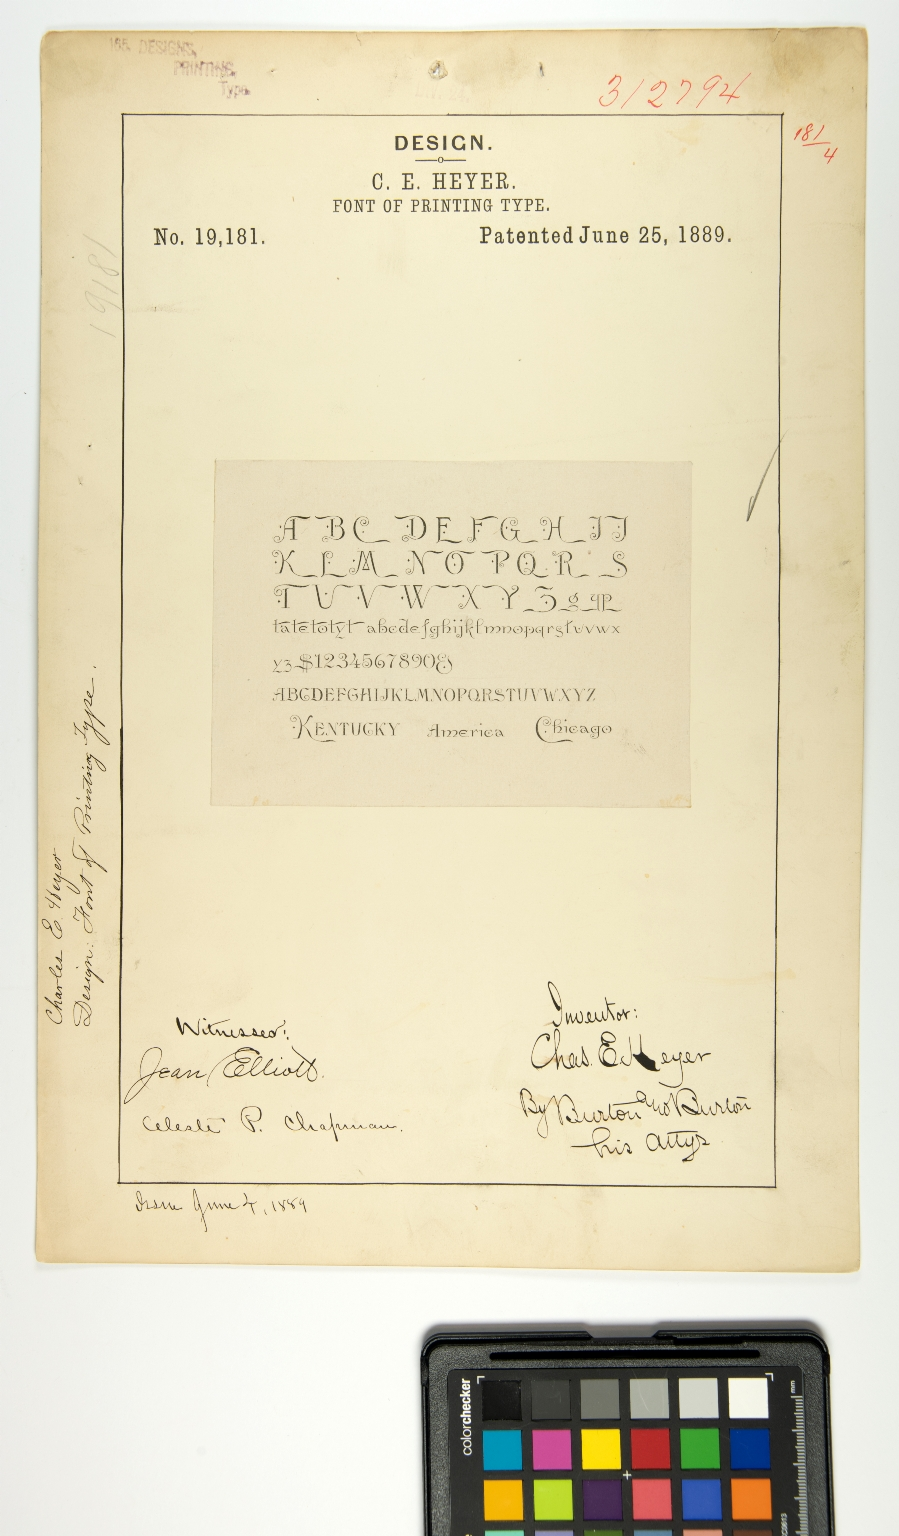 C.E. Heyer, Font of Printing Type